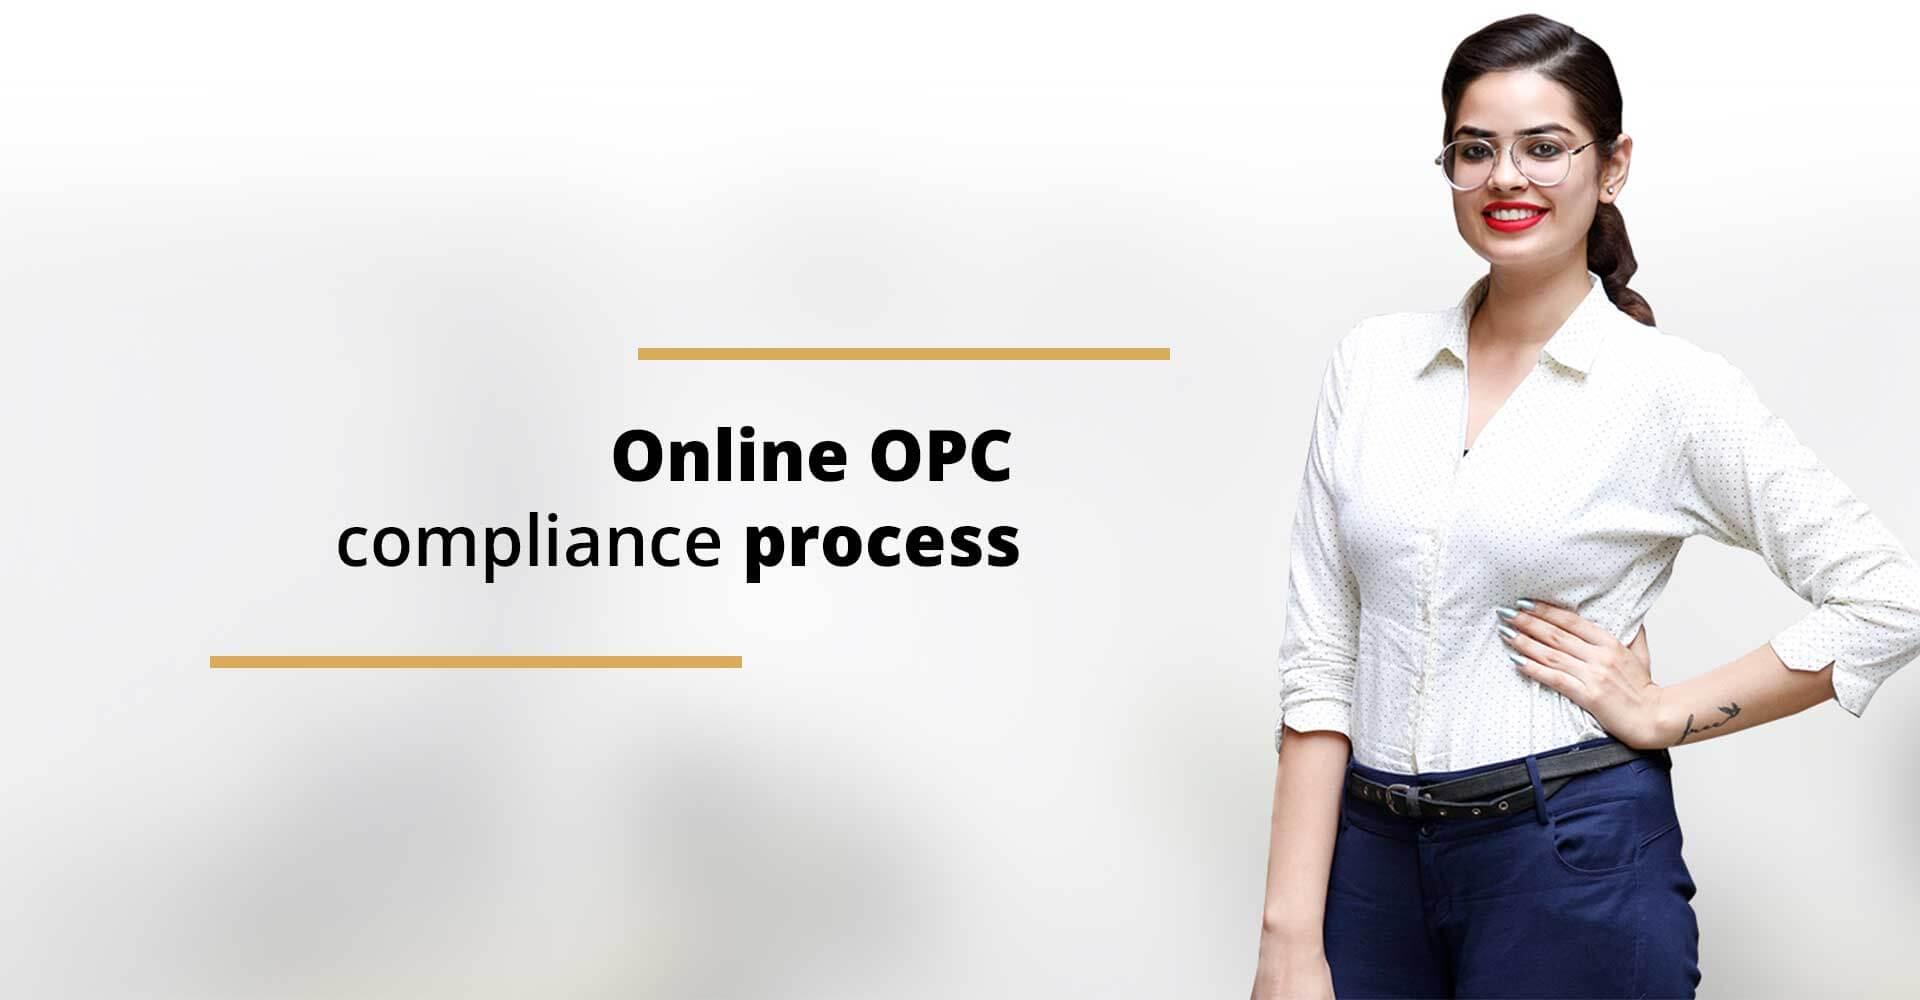 Online OPC compliance process